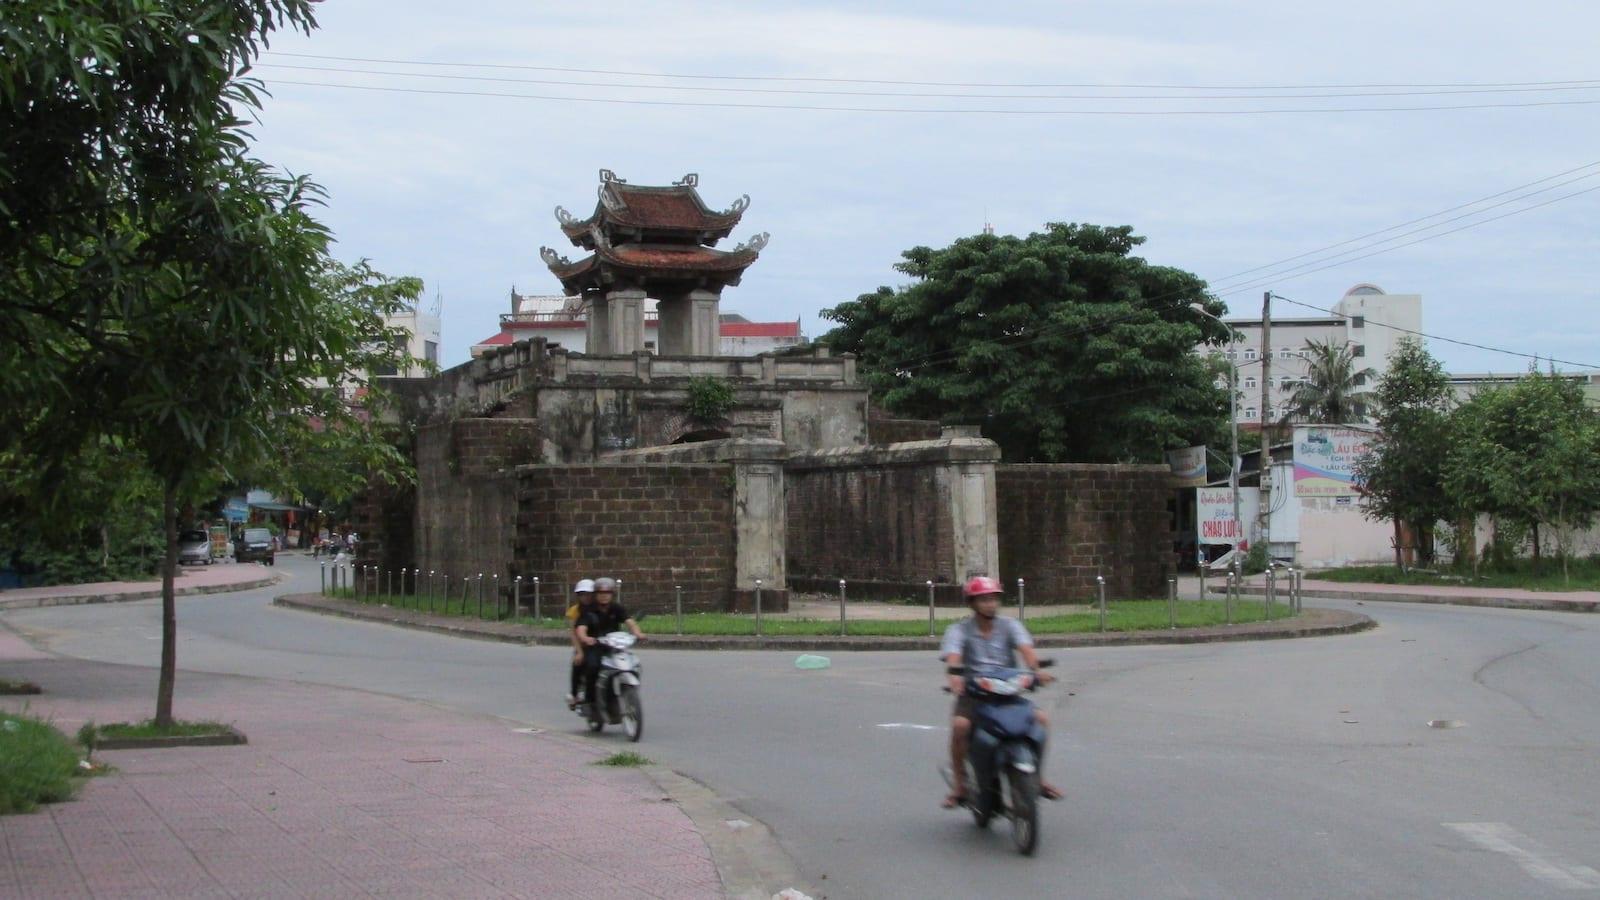 Nghệ An Citadel